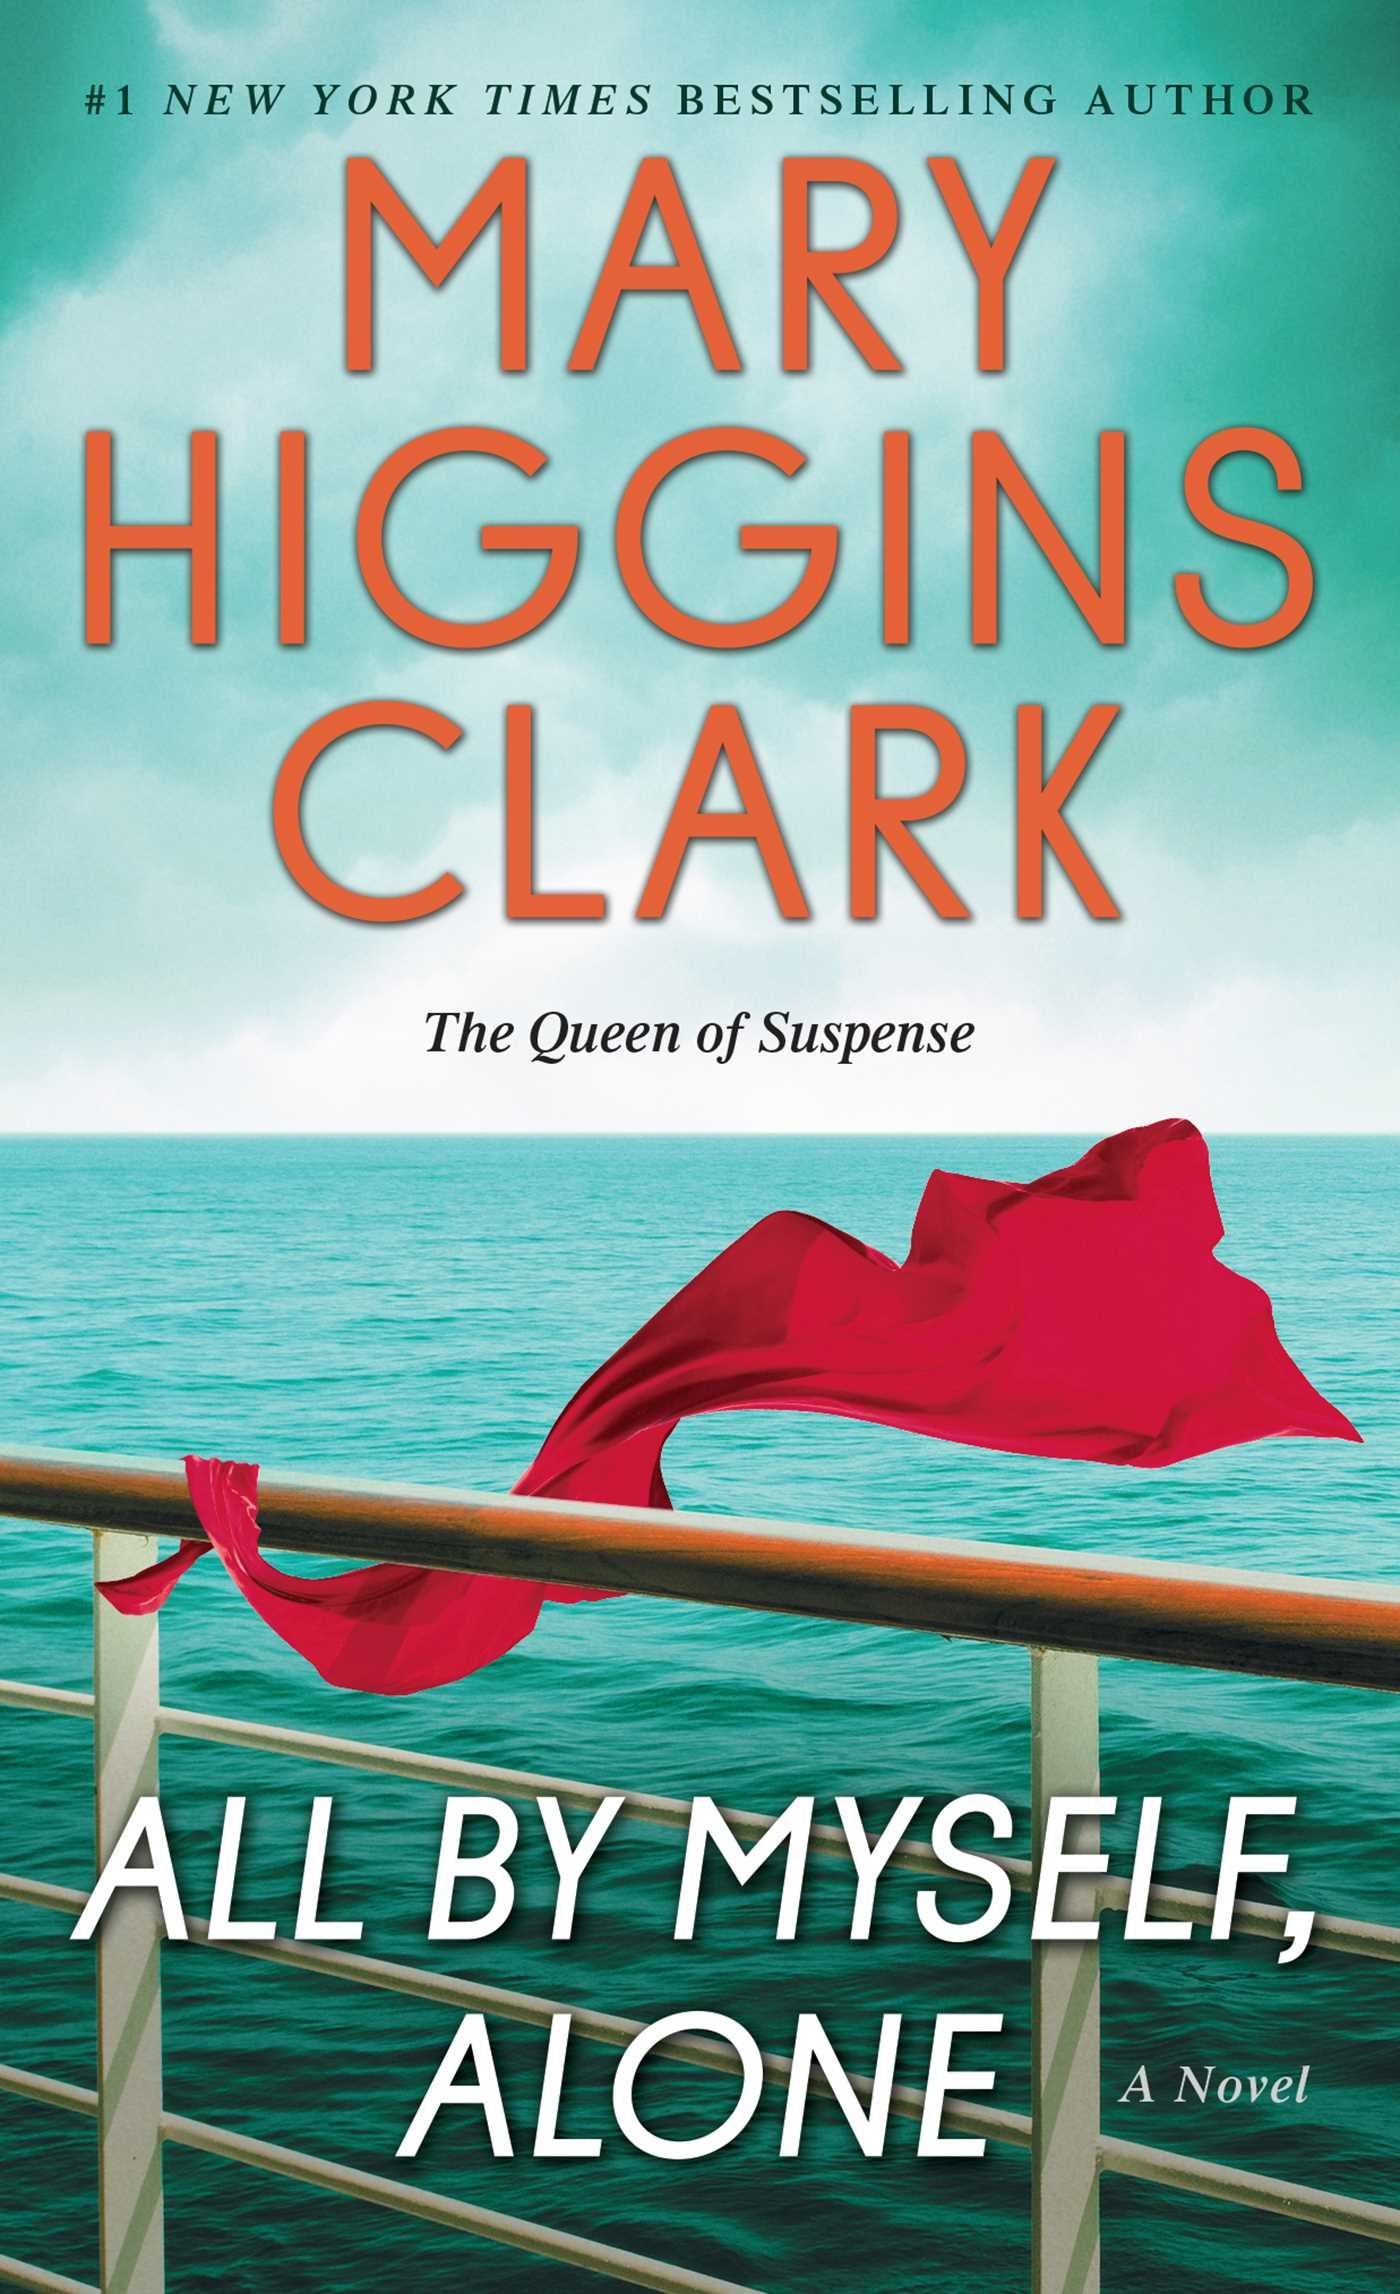 All By Myself, Alone: A Novel